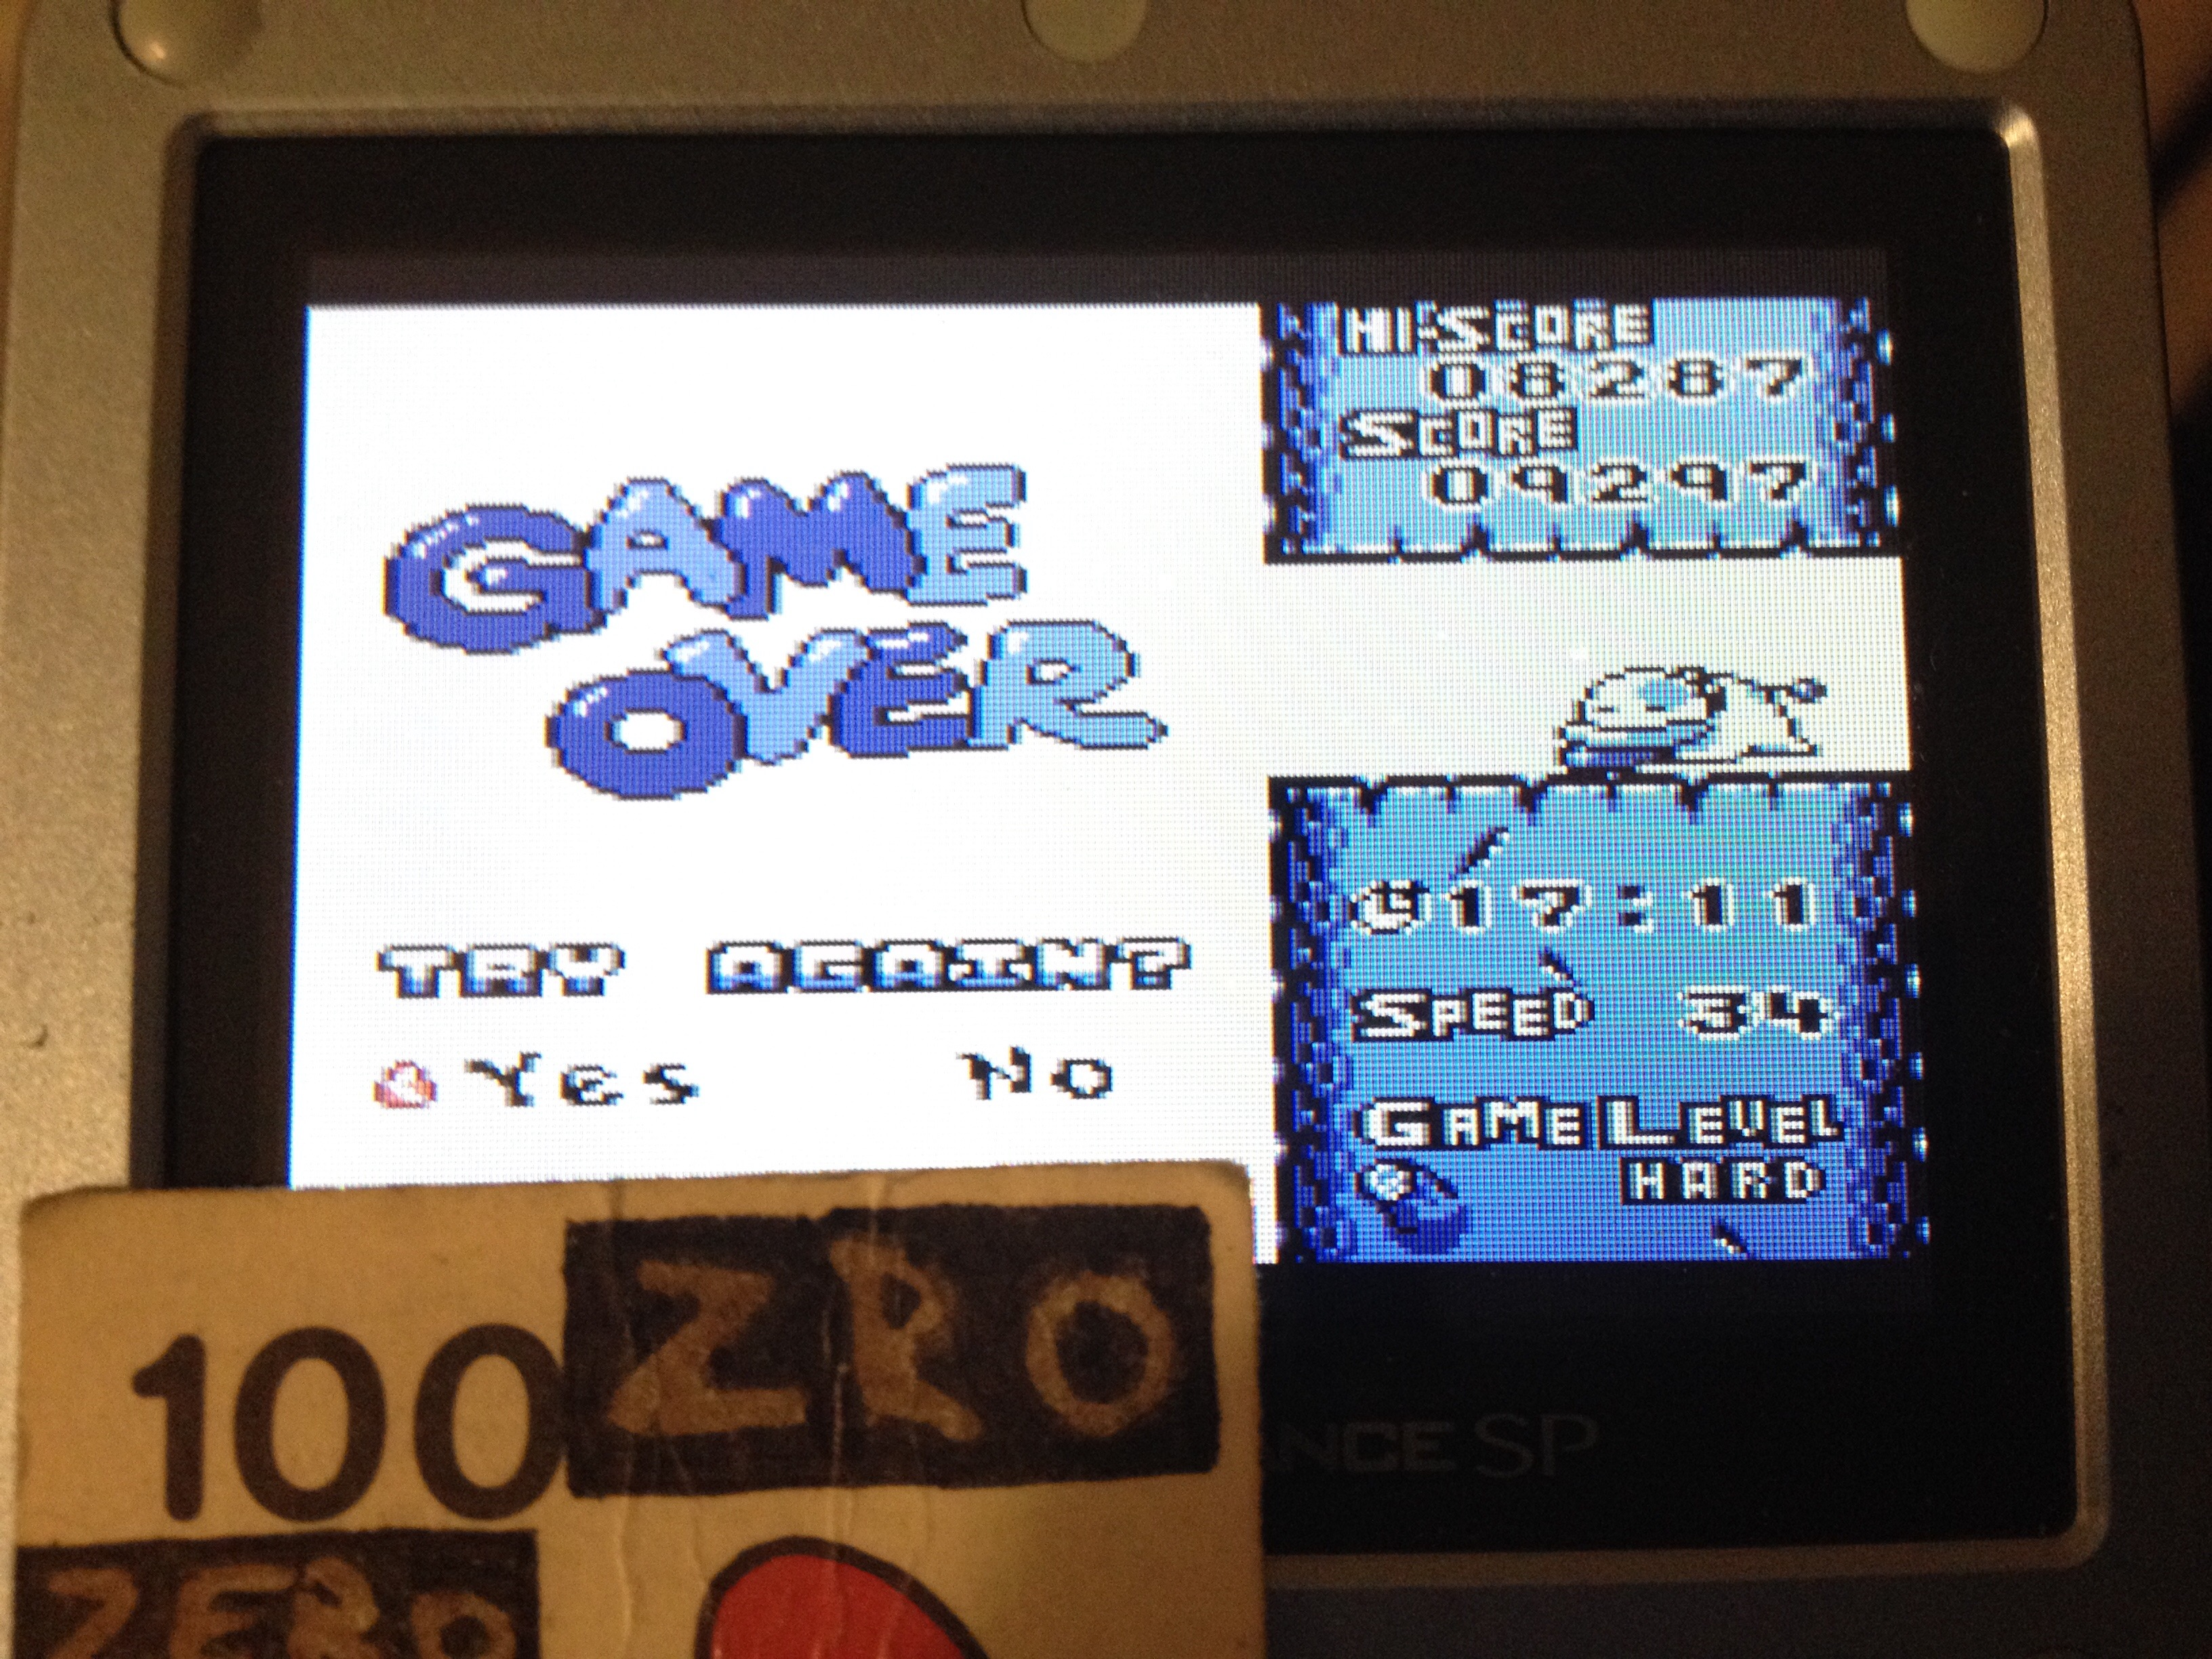 zerooskul: Tetris Attack: Endless [Hard] (Game Boy) 9,297 points on 2019-05-08 20:56:10